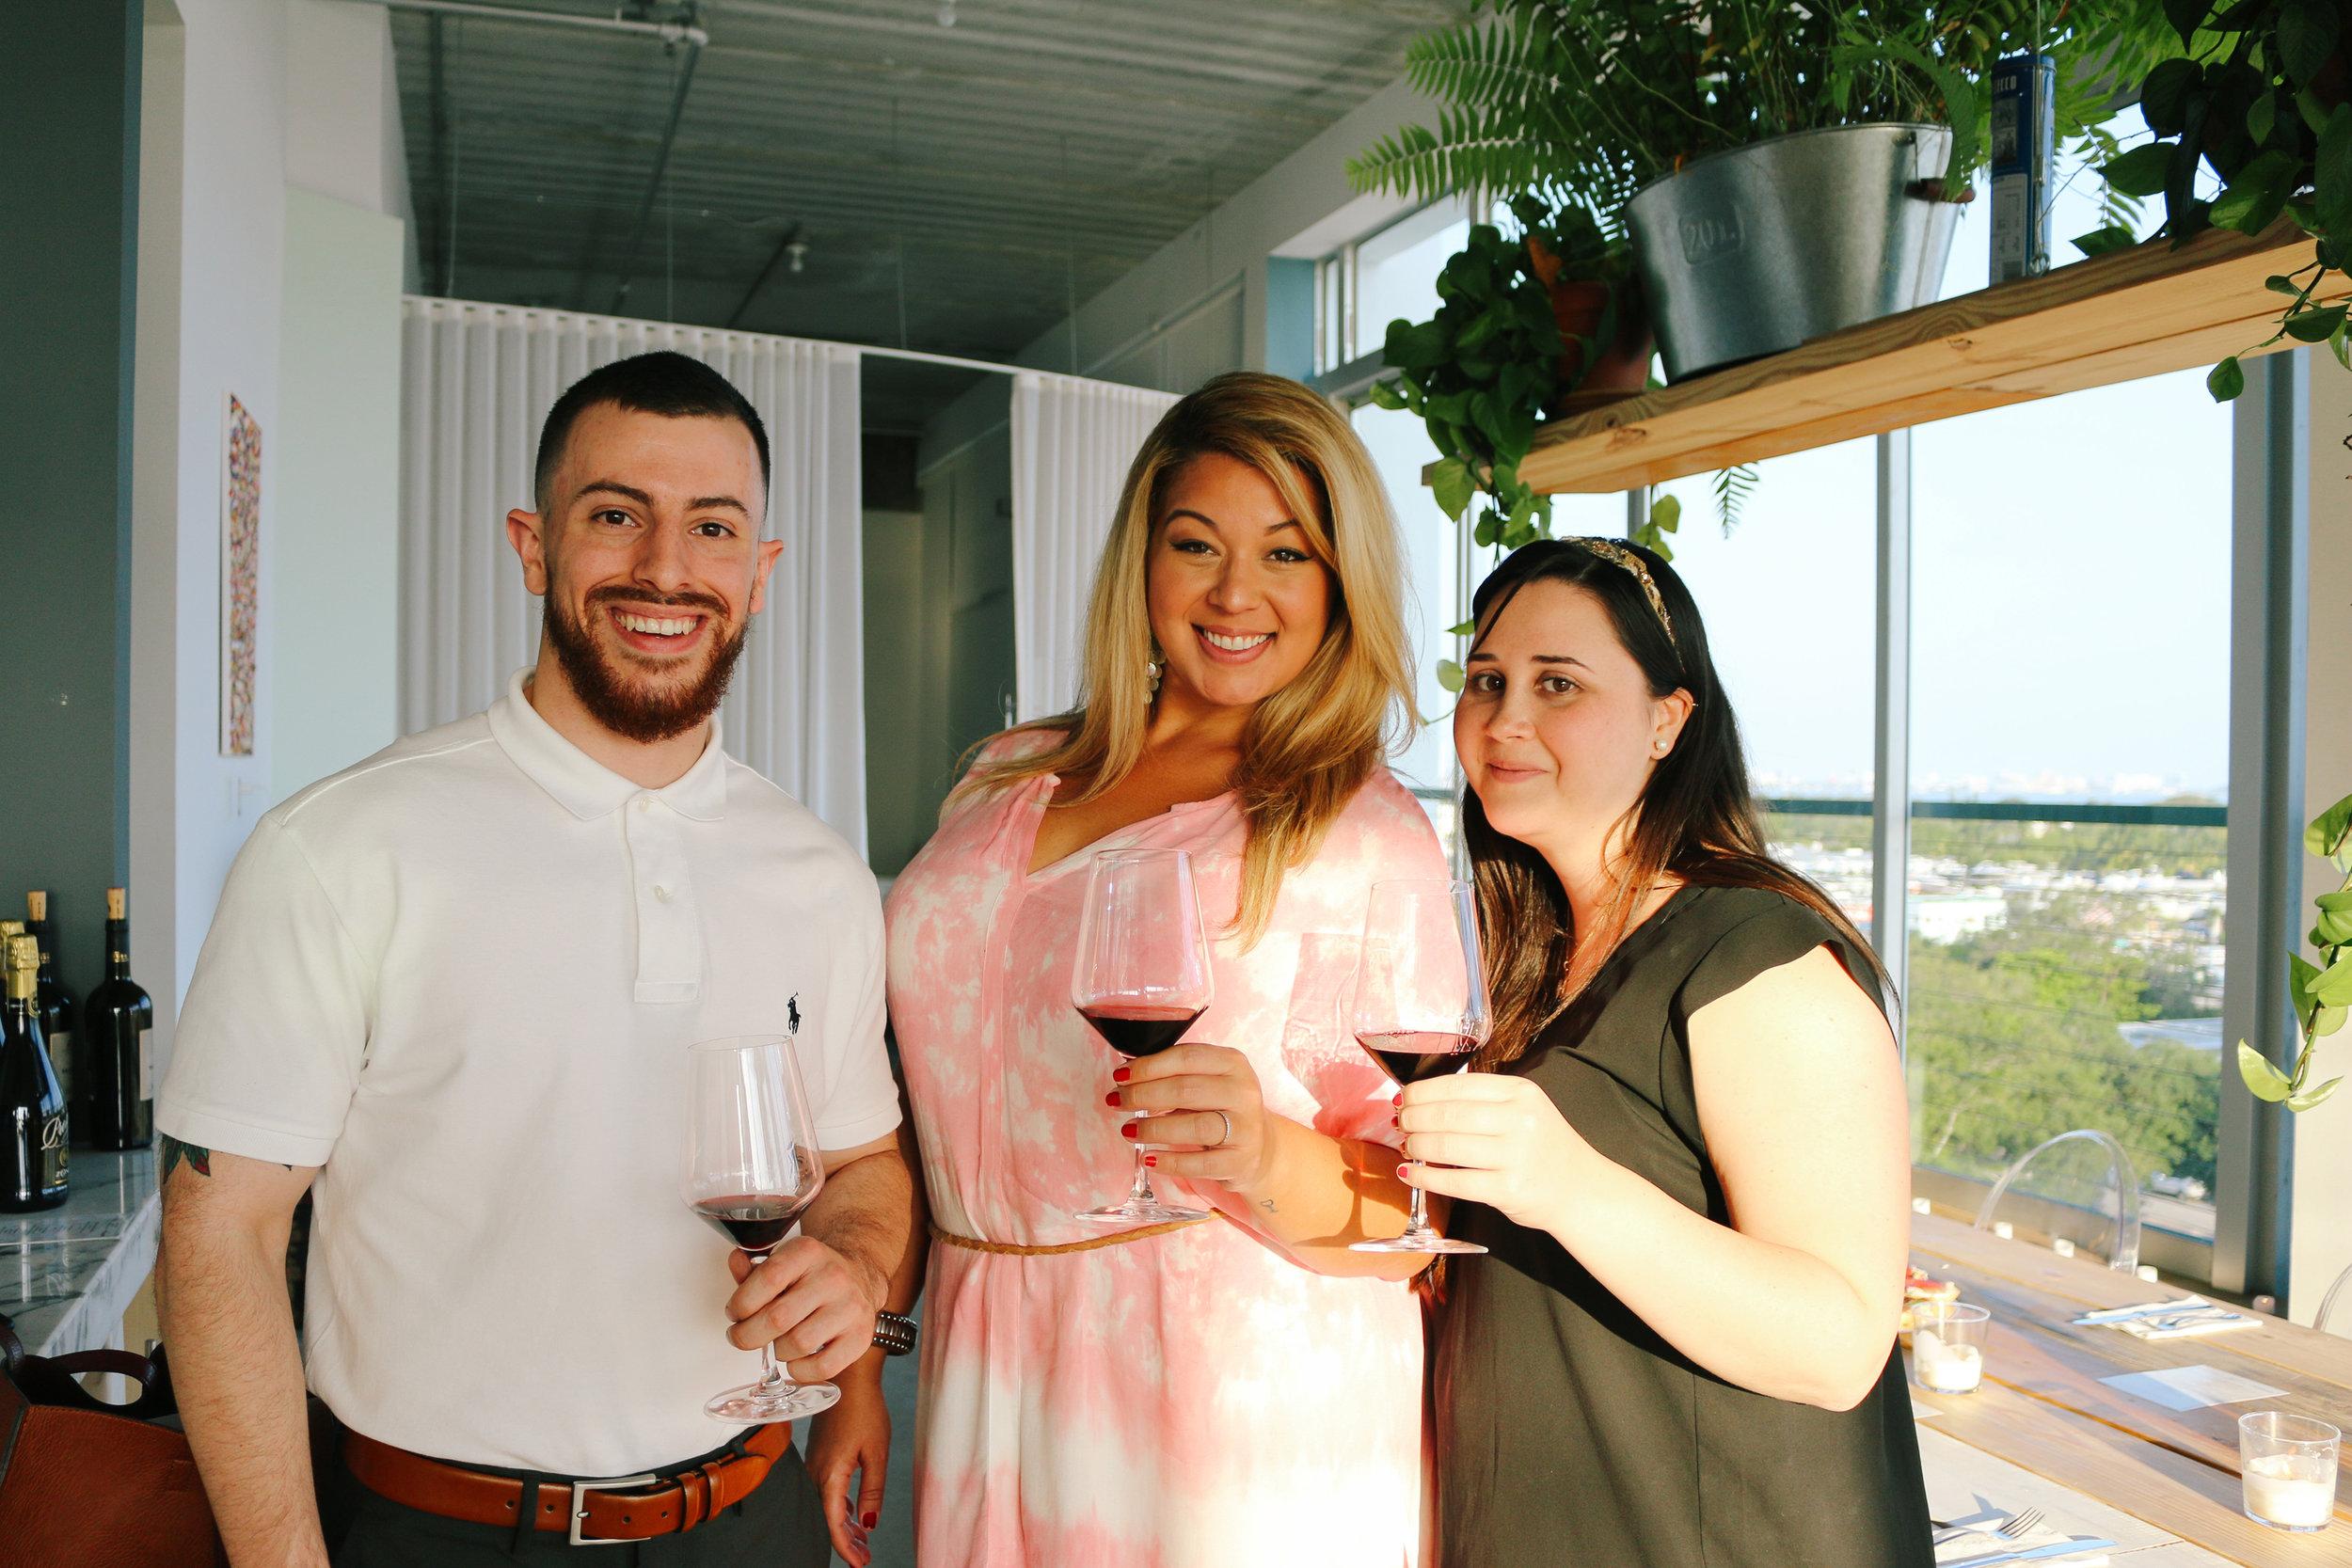 Women Who Wine Uncorked Conversations-Miami Wine Events-Wine Tasting Miami-4.jpg